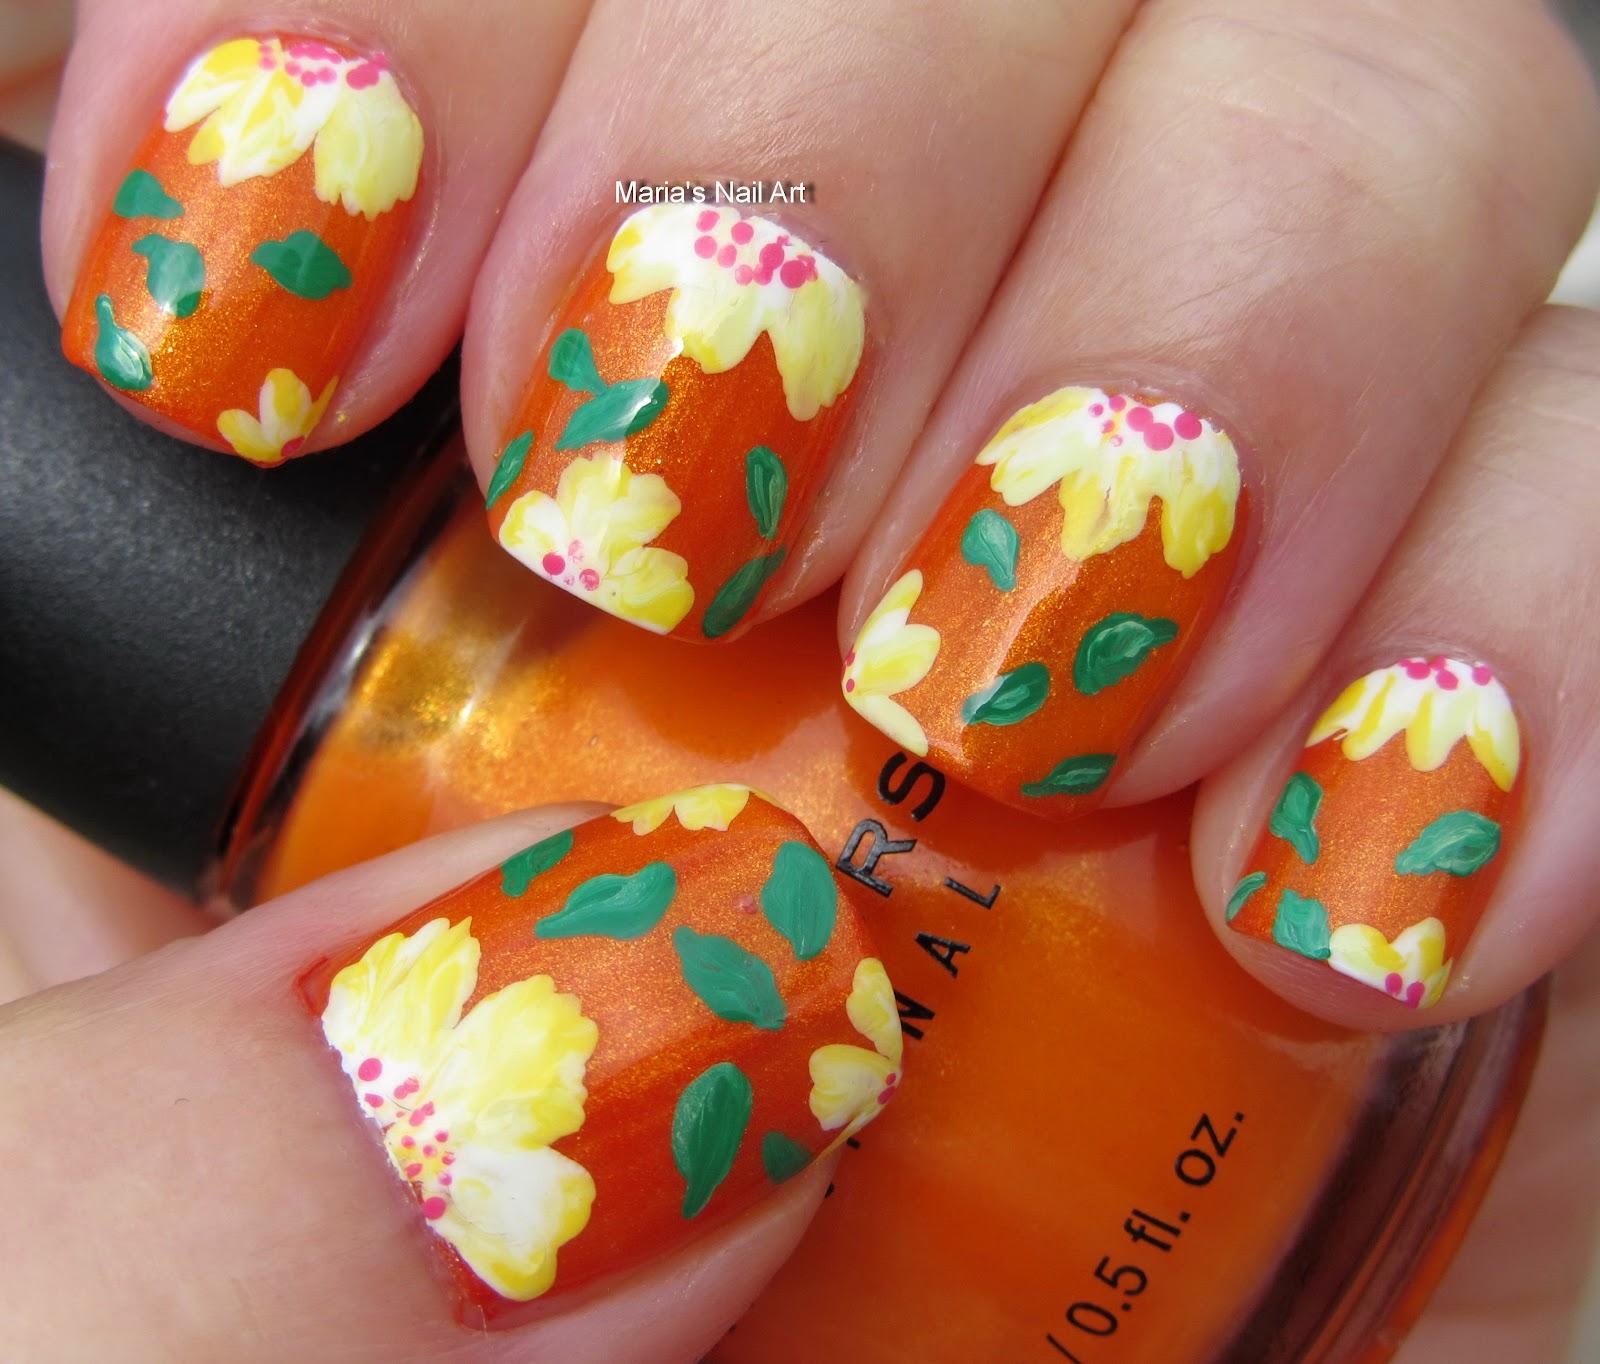 Marias Nail Art And Polish Blog: On Orange